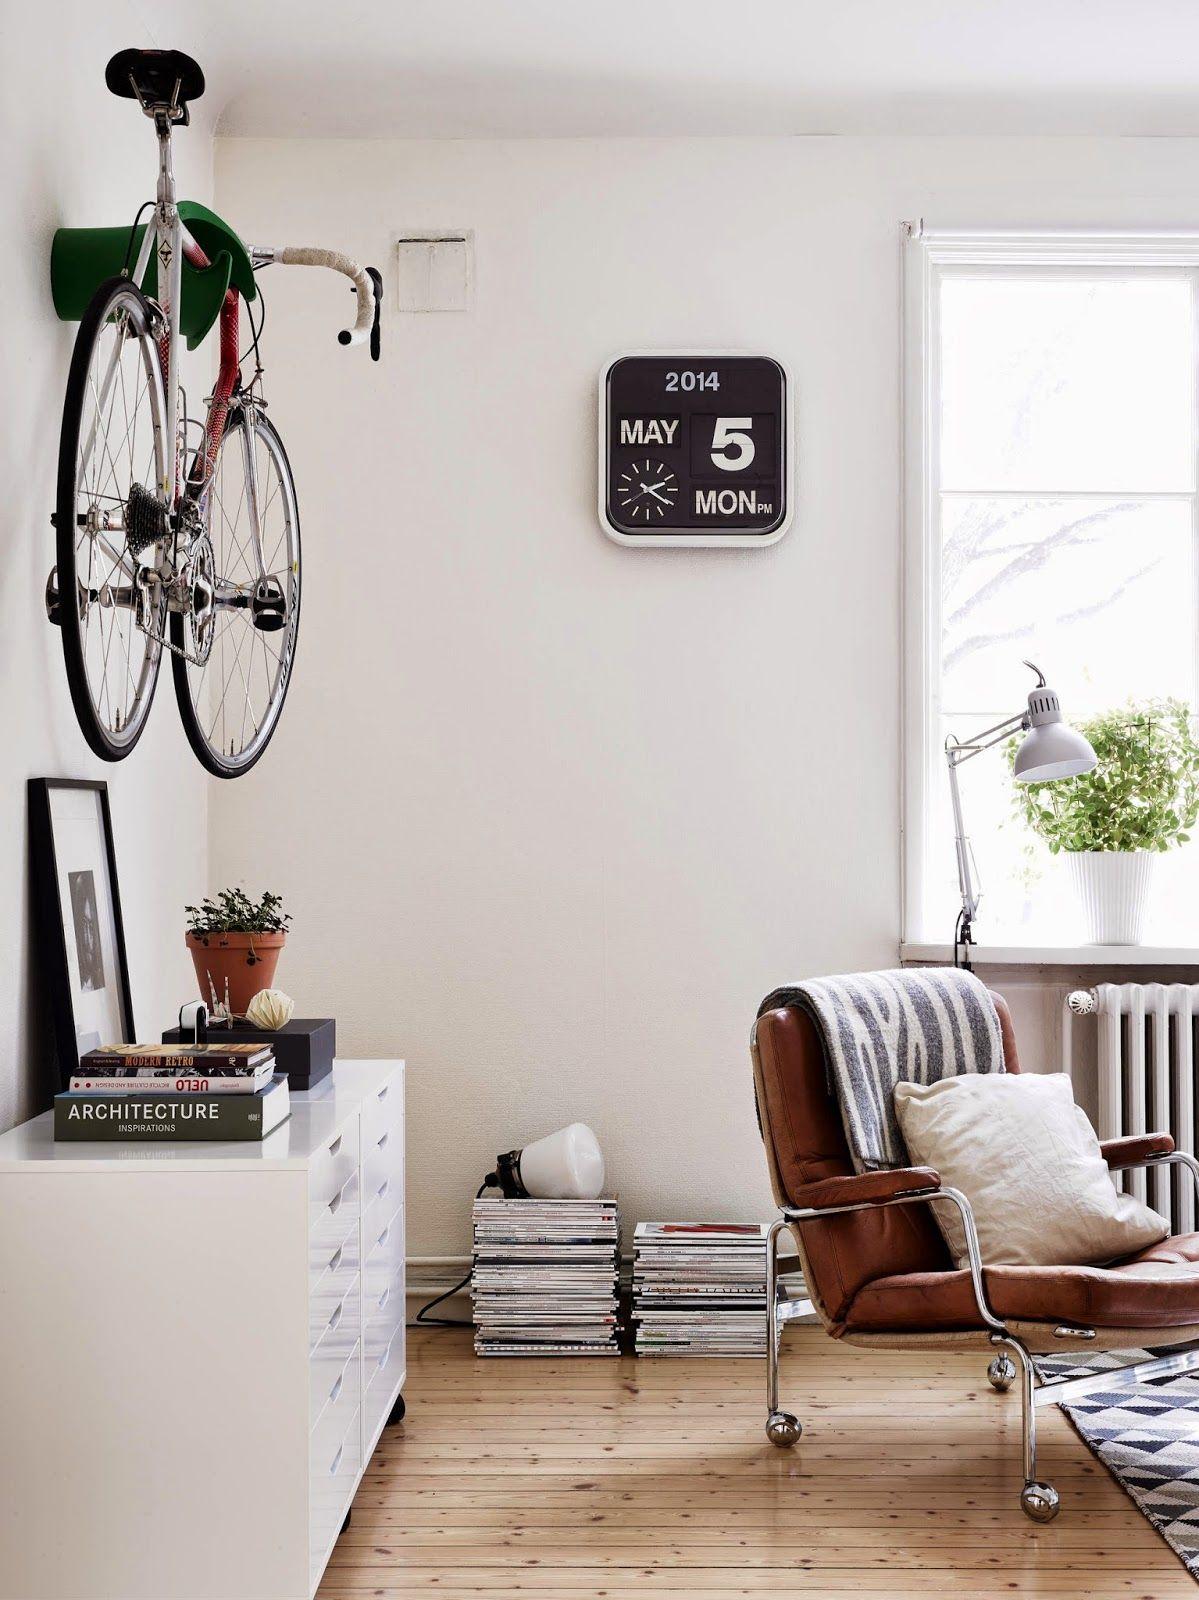 My Scandinavian Home A Very Cool Swedish Space With A Bike